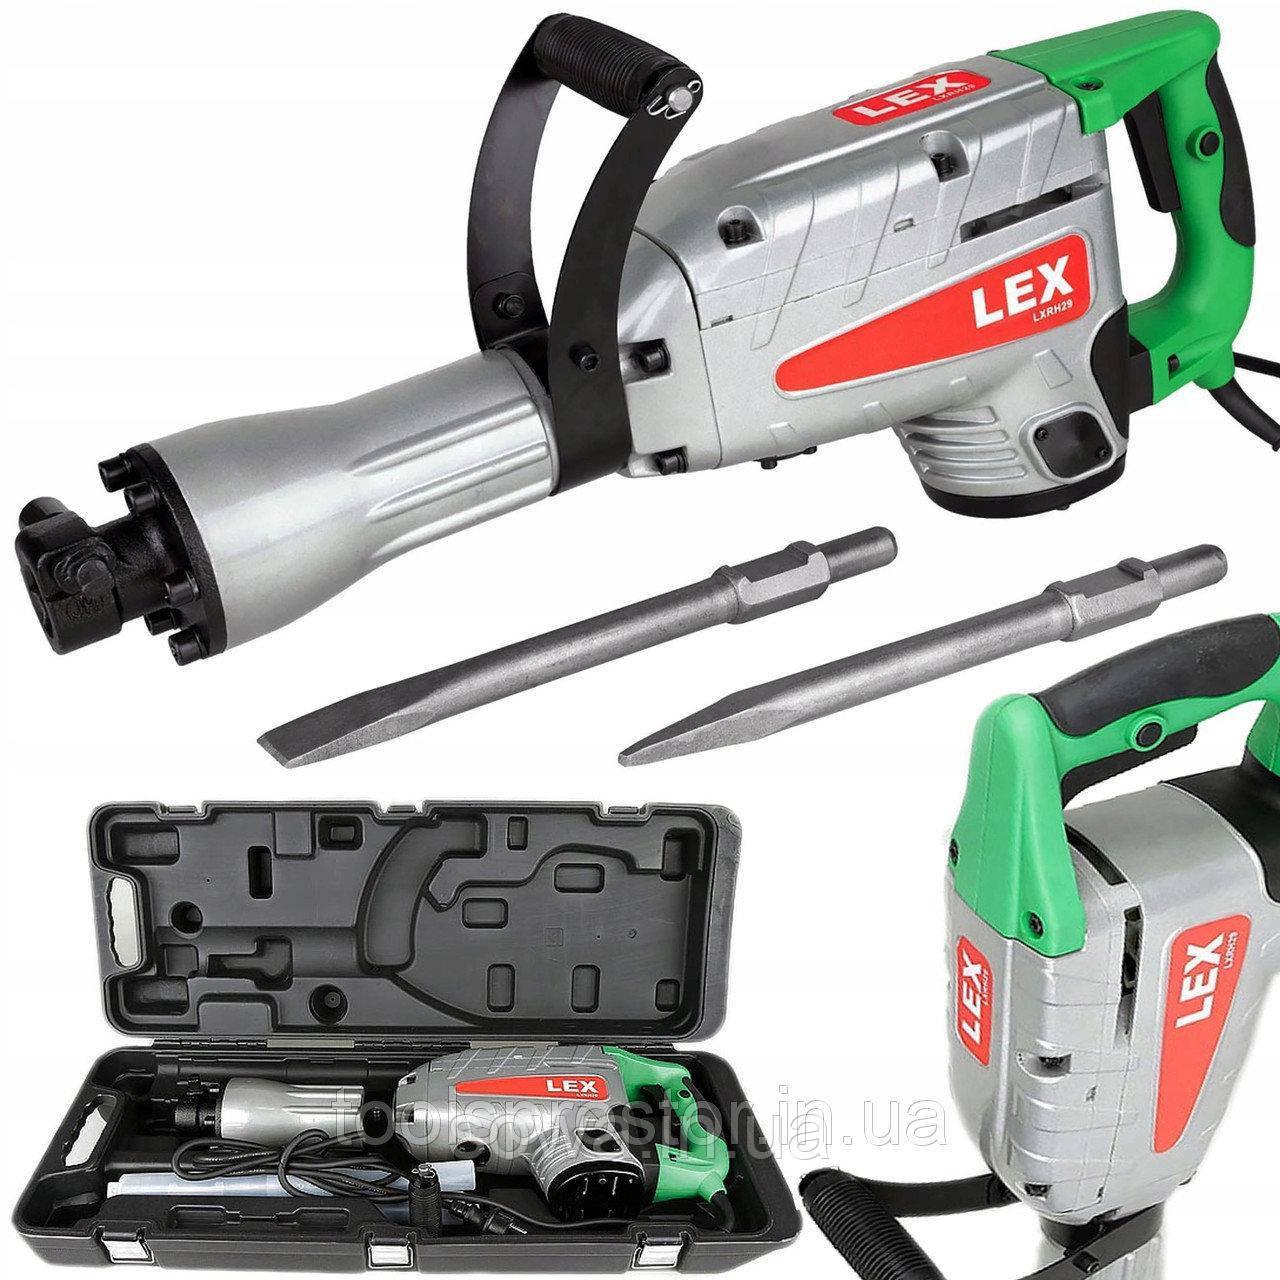 ✔️ Отбойный молоток электрический  LEX LXR29